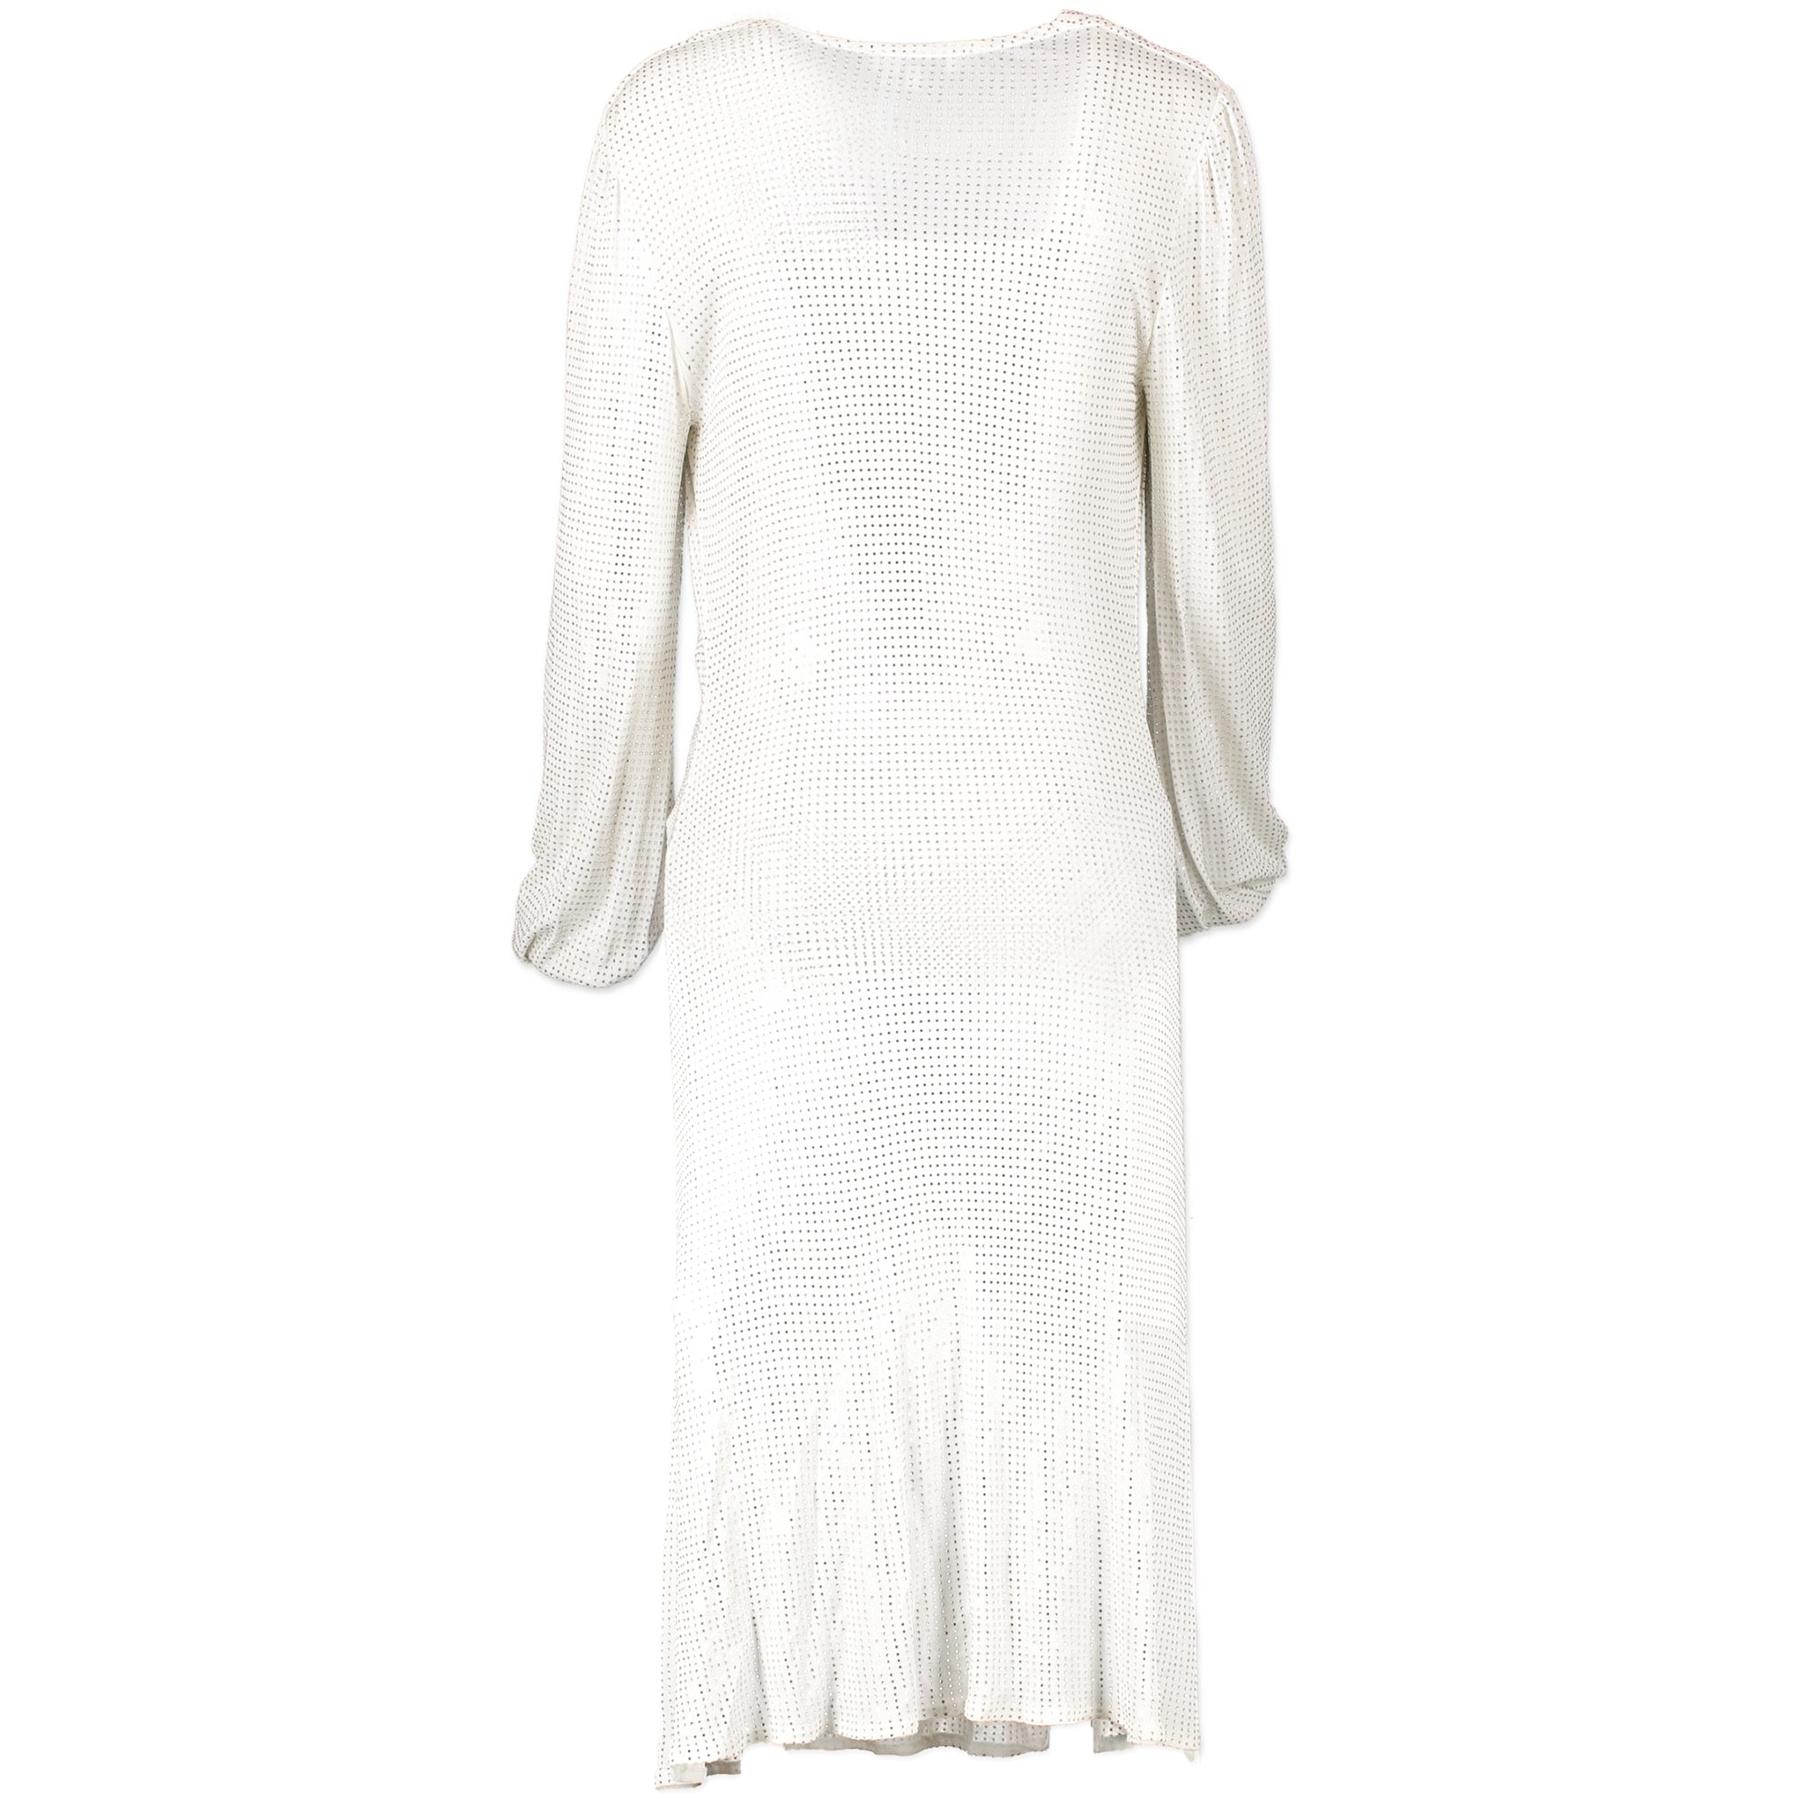 Celine White Dress With Swarovski Rhinestones